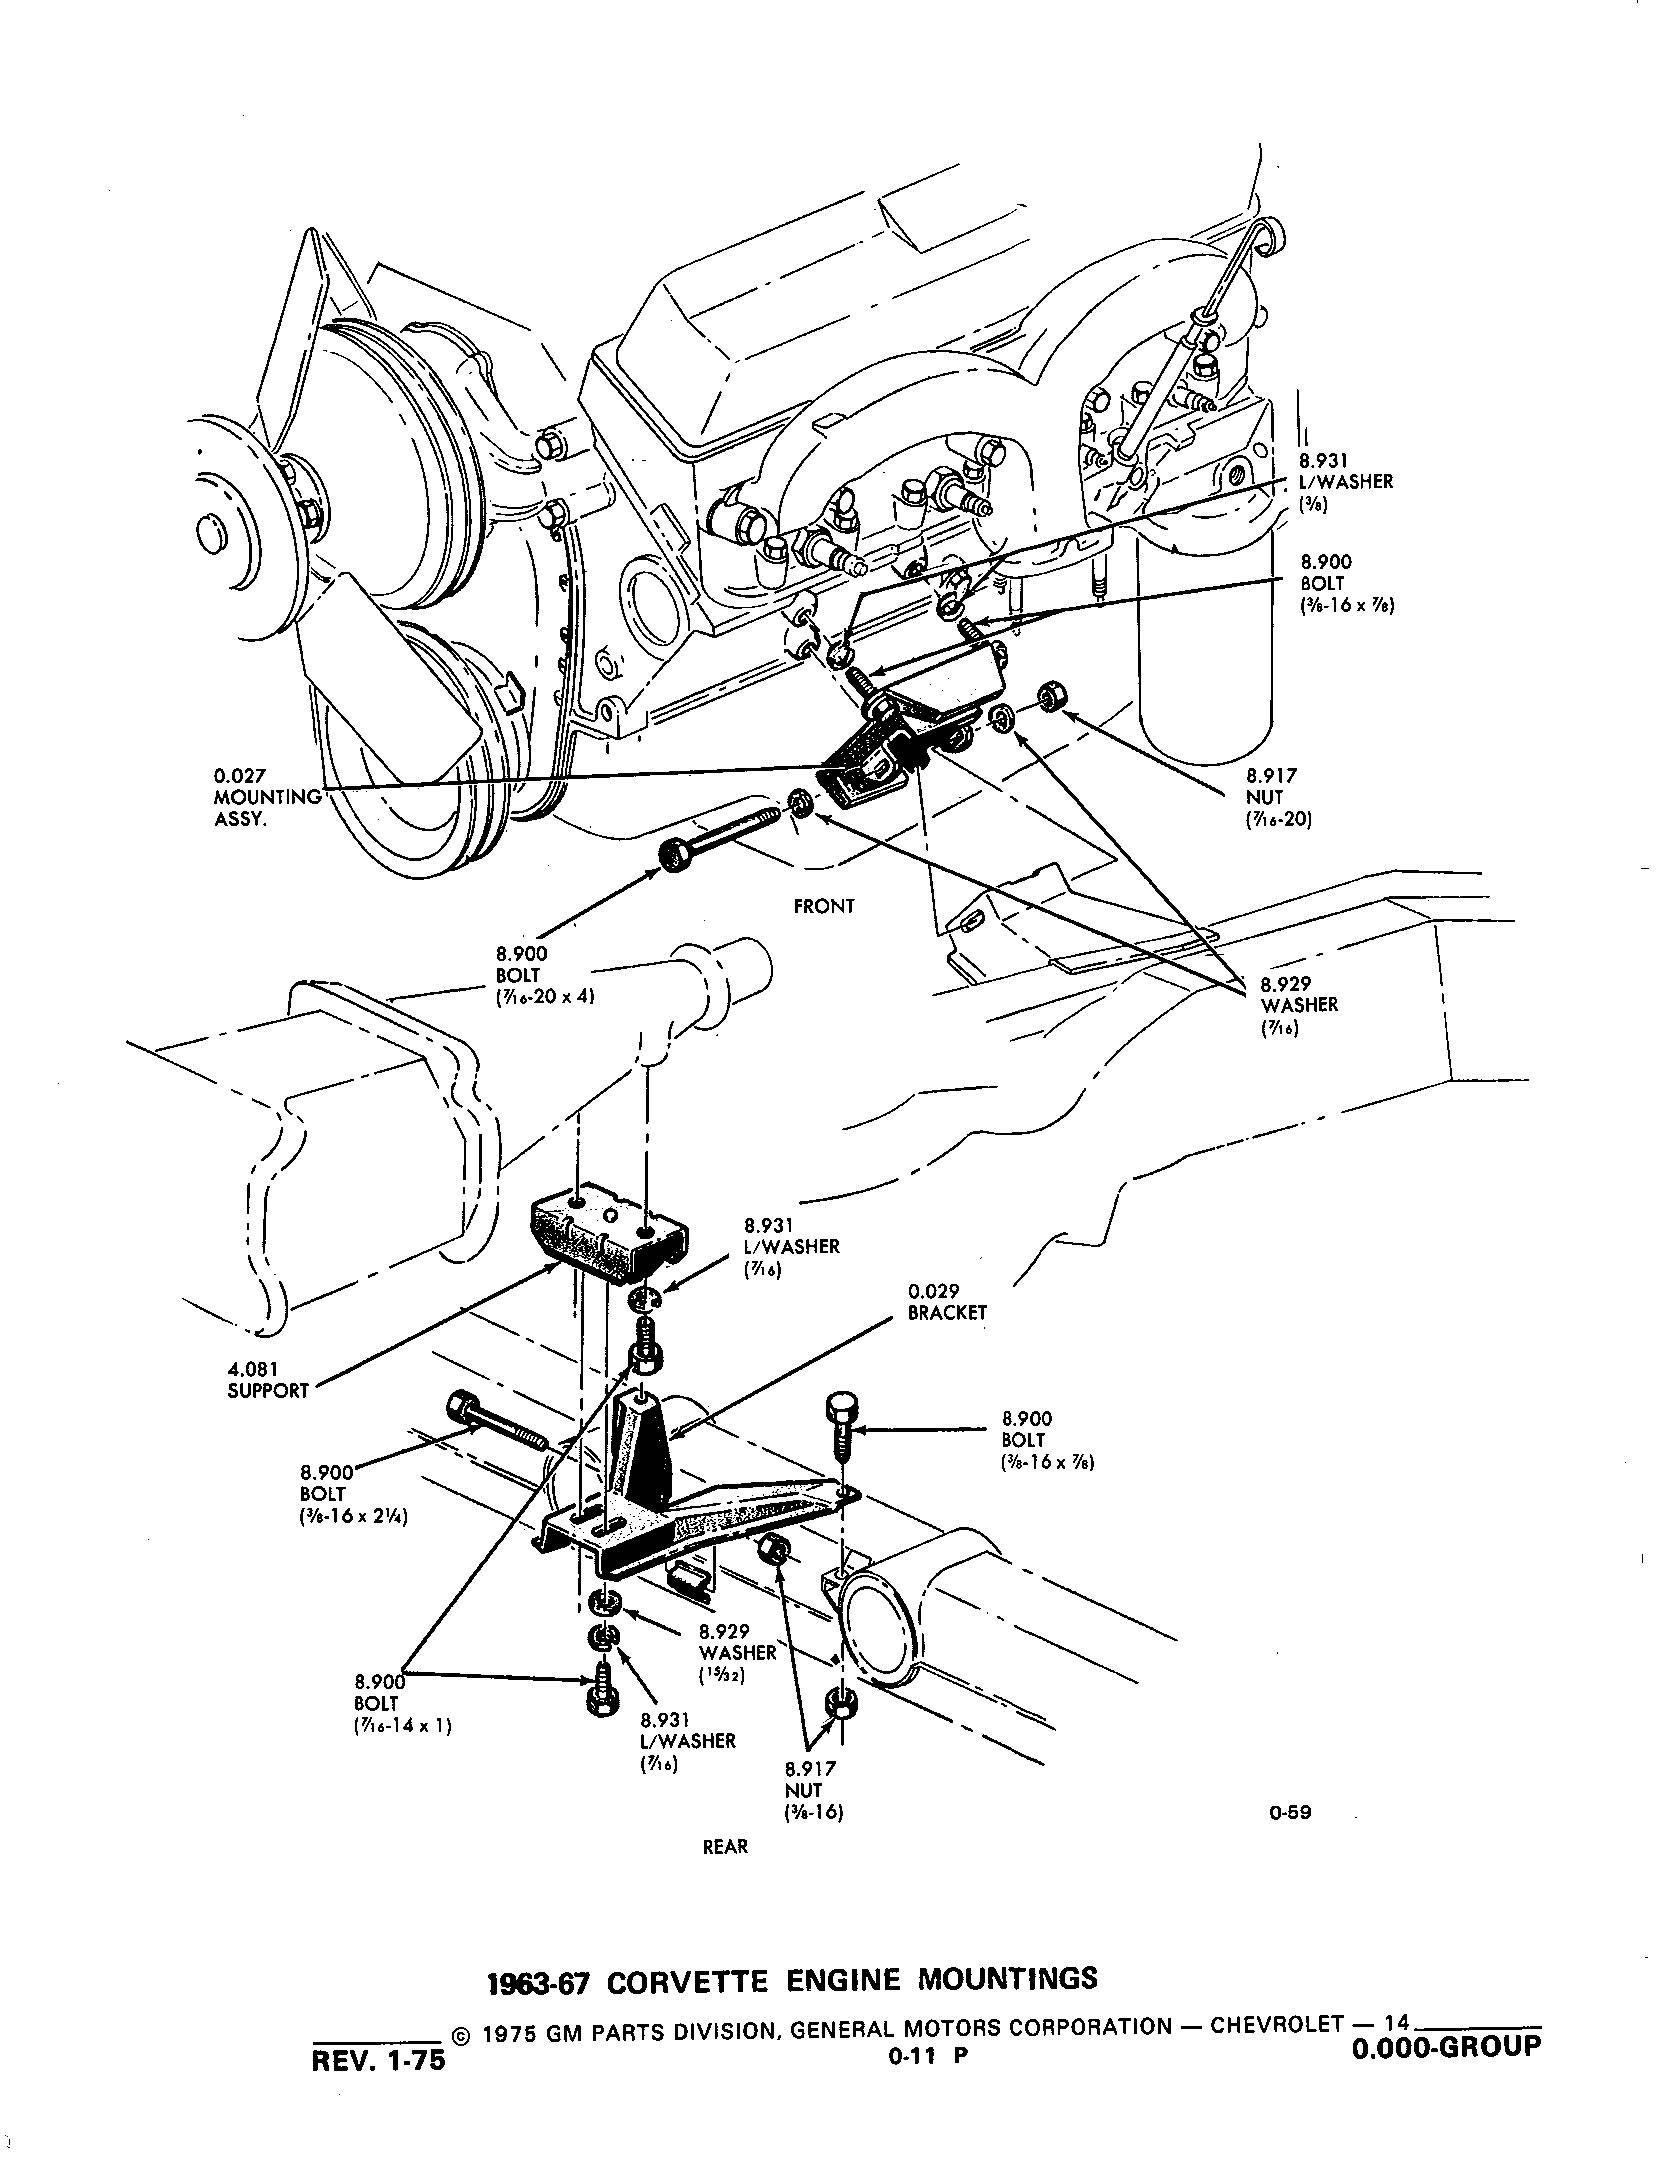 group 0 000 engine clutch53  1953